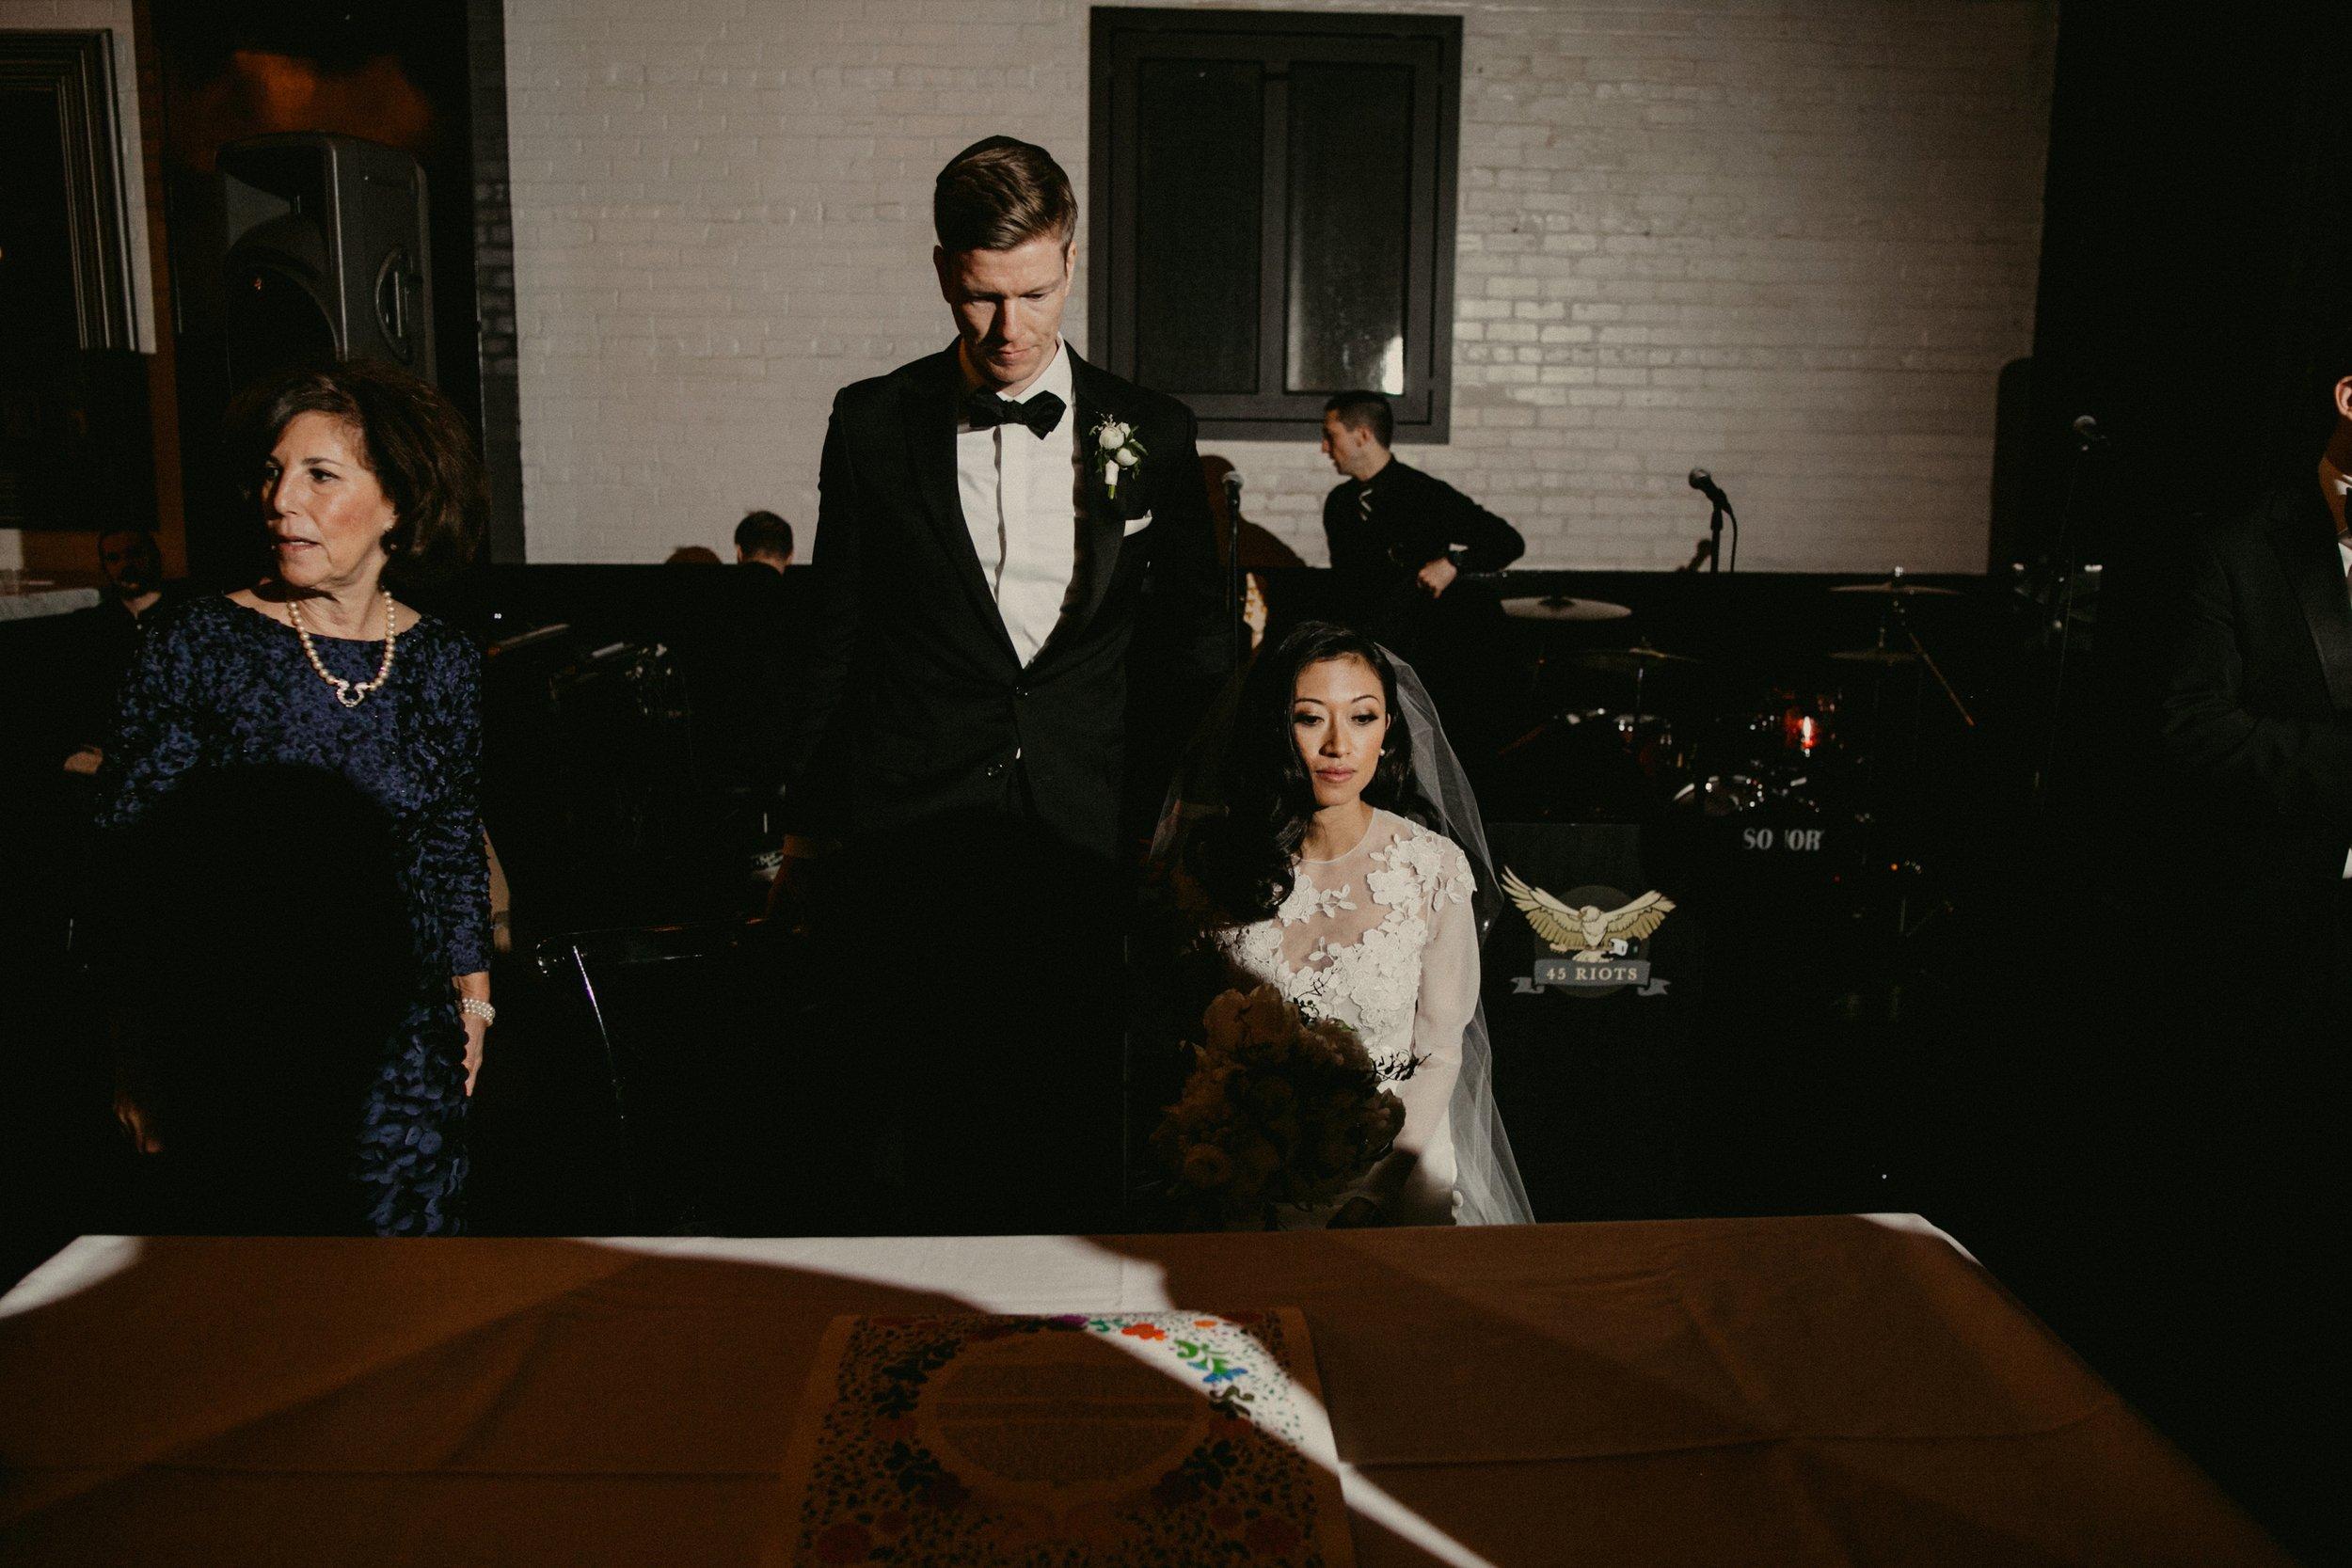 501_union_wedding_chellise_michael_photography-2480.jpg